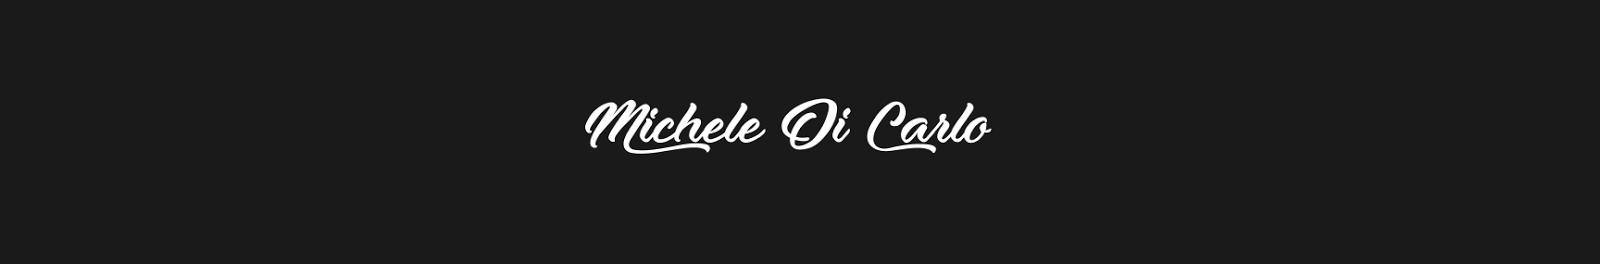 Michele Di Carlo